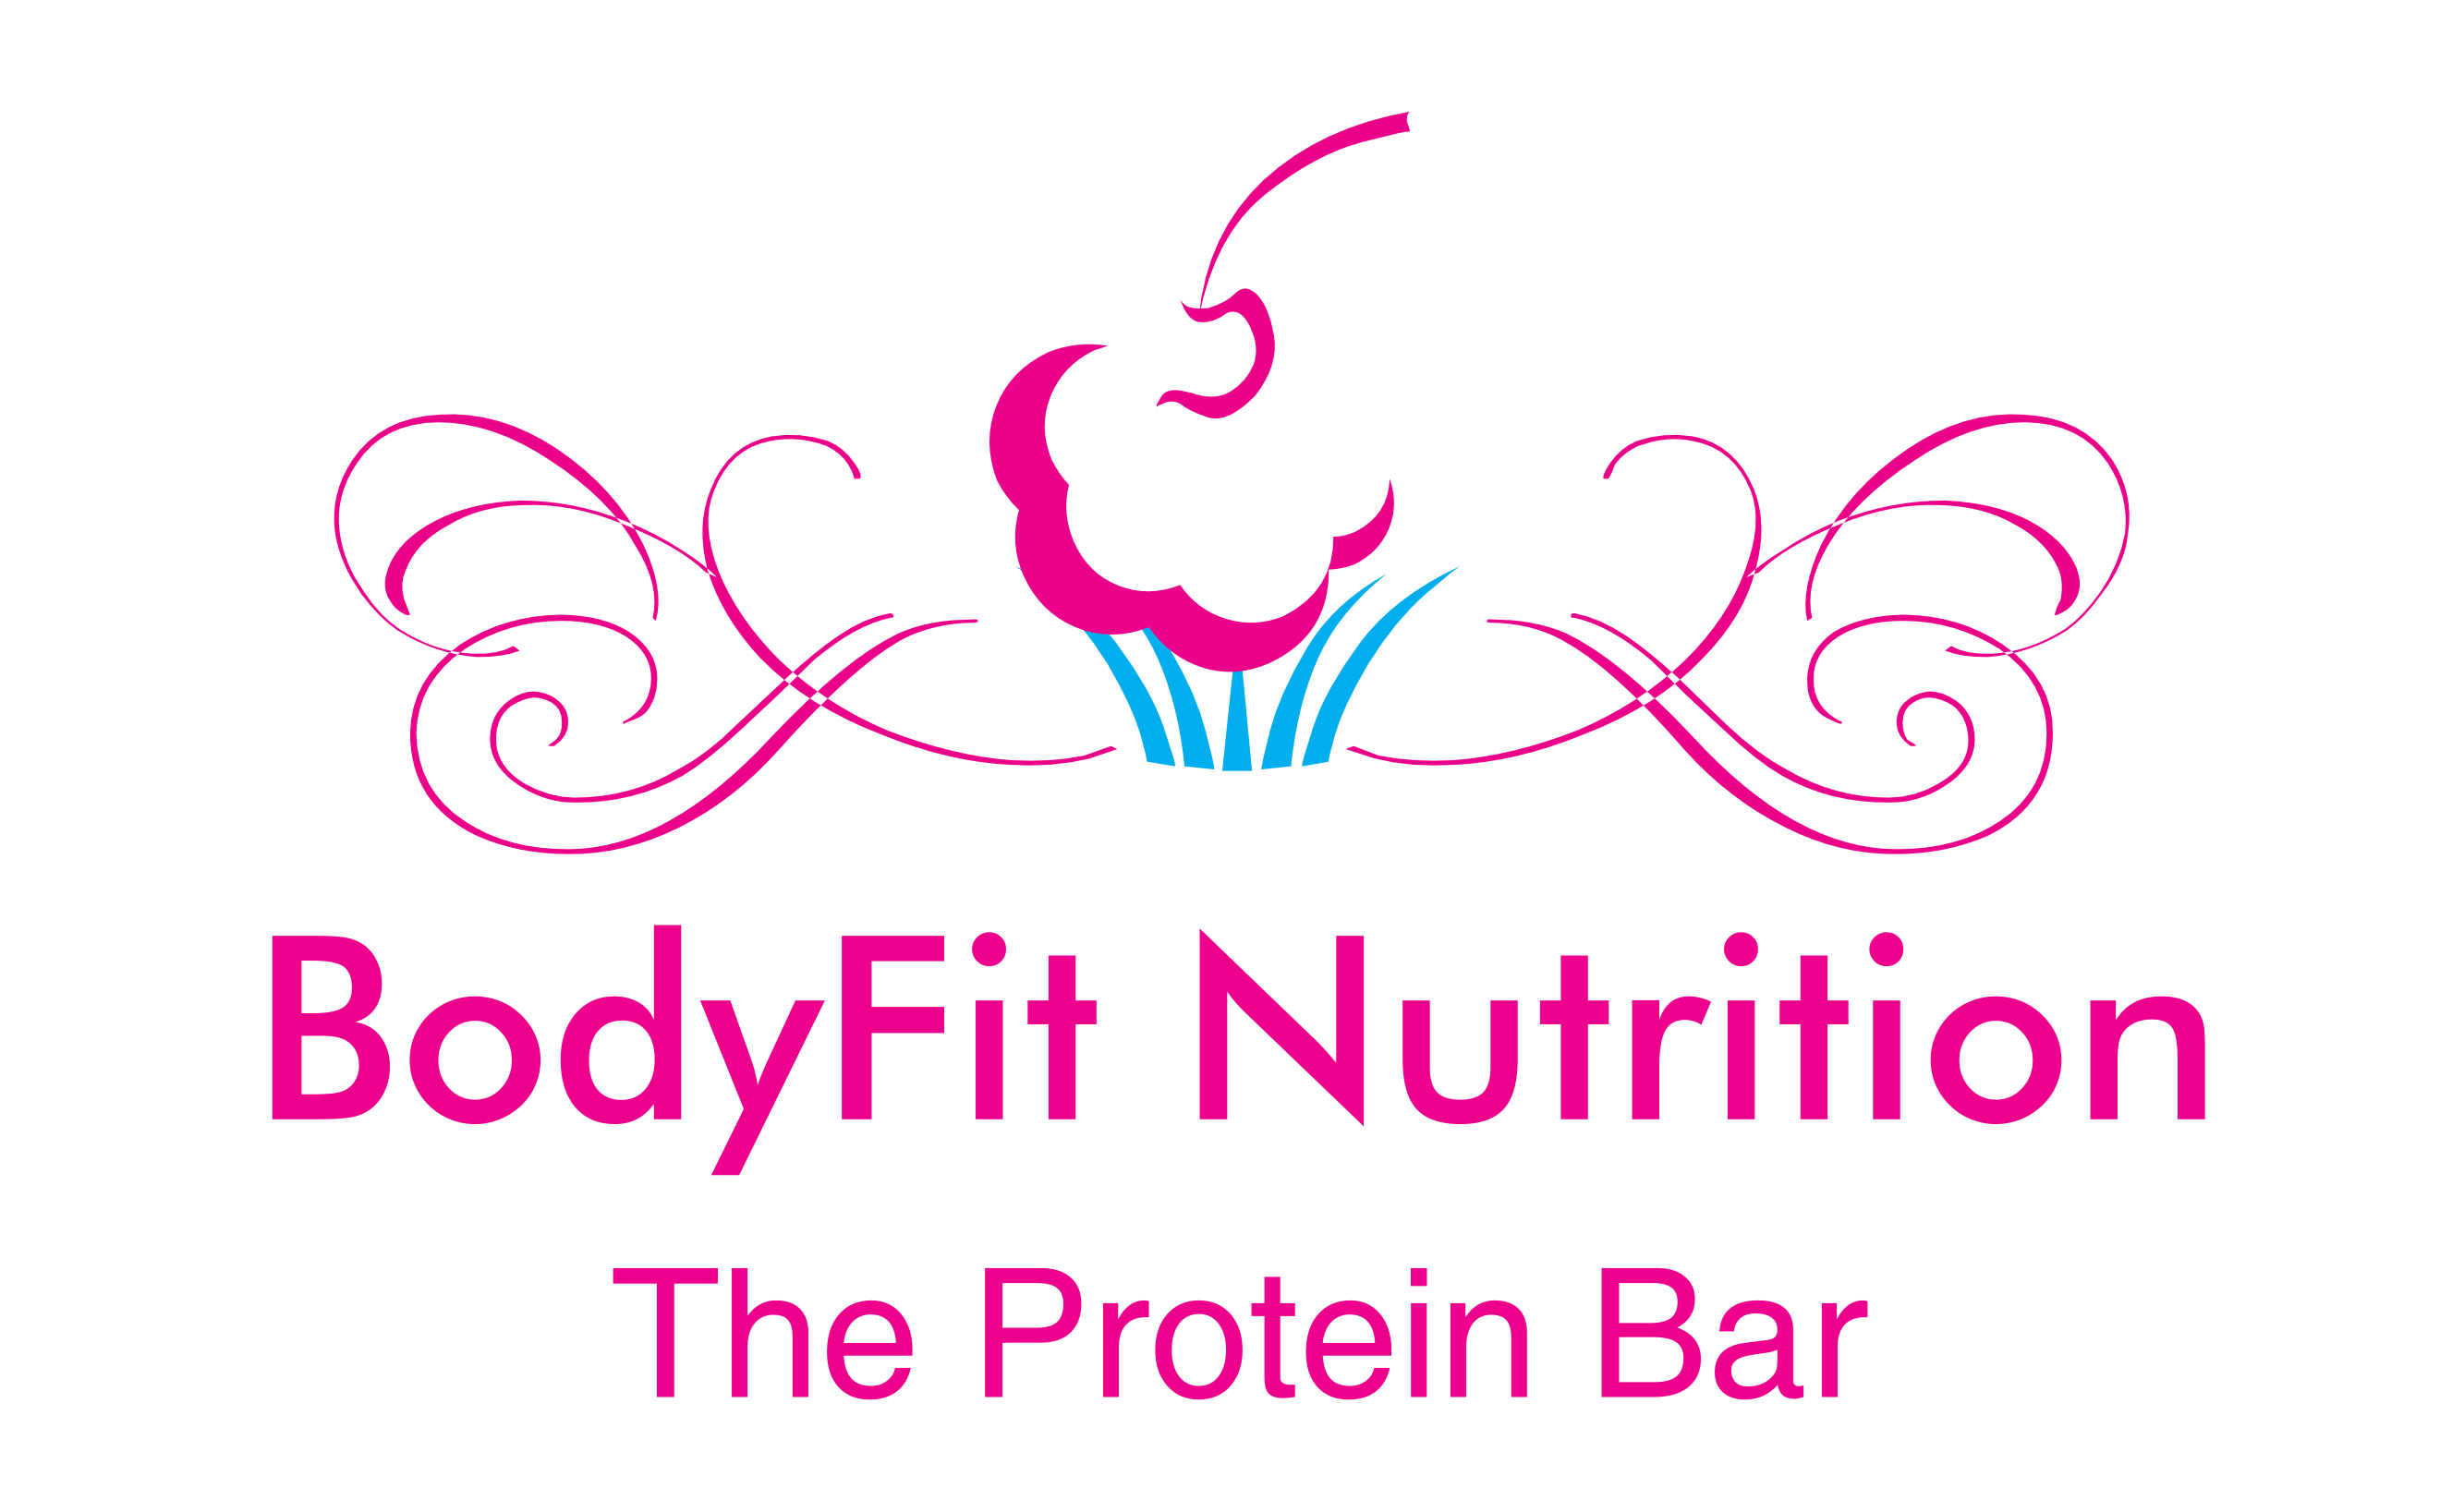 BodyFit Nutrition